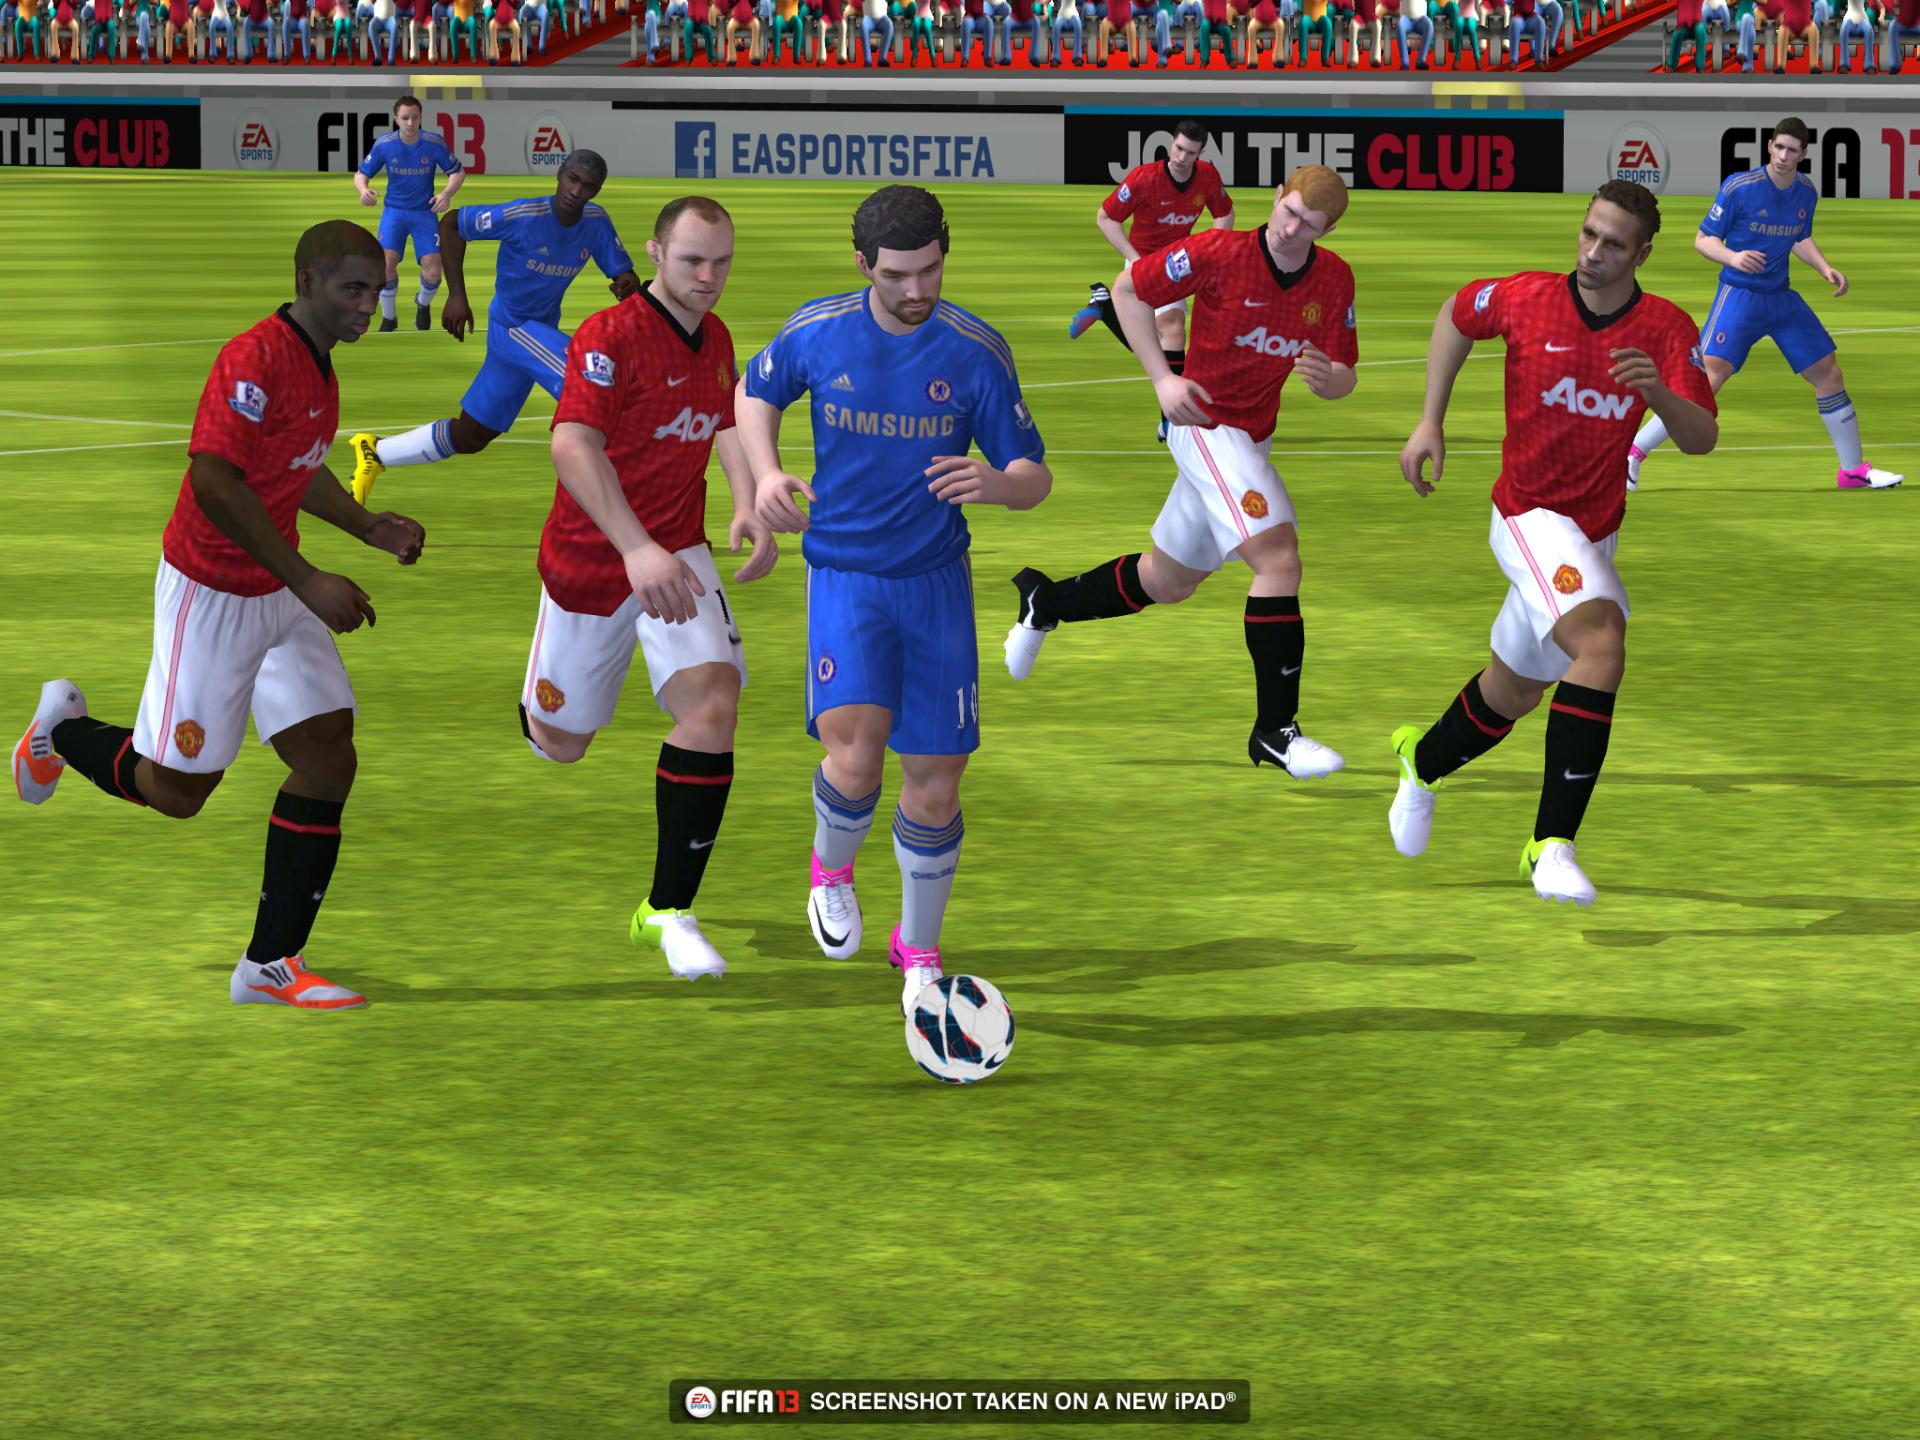 Obrázky z iOS verze FIFA 13 70831